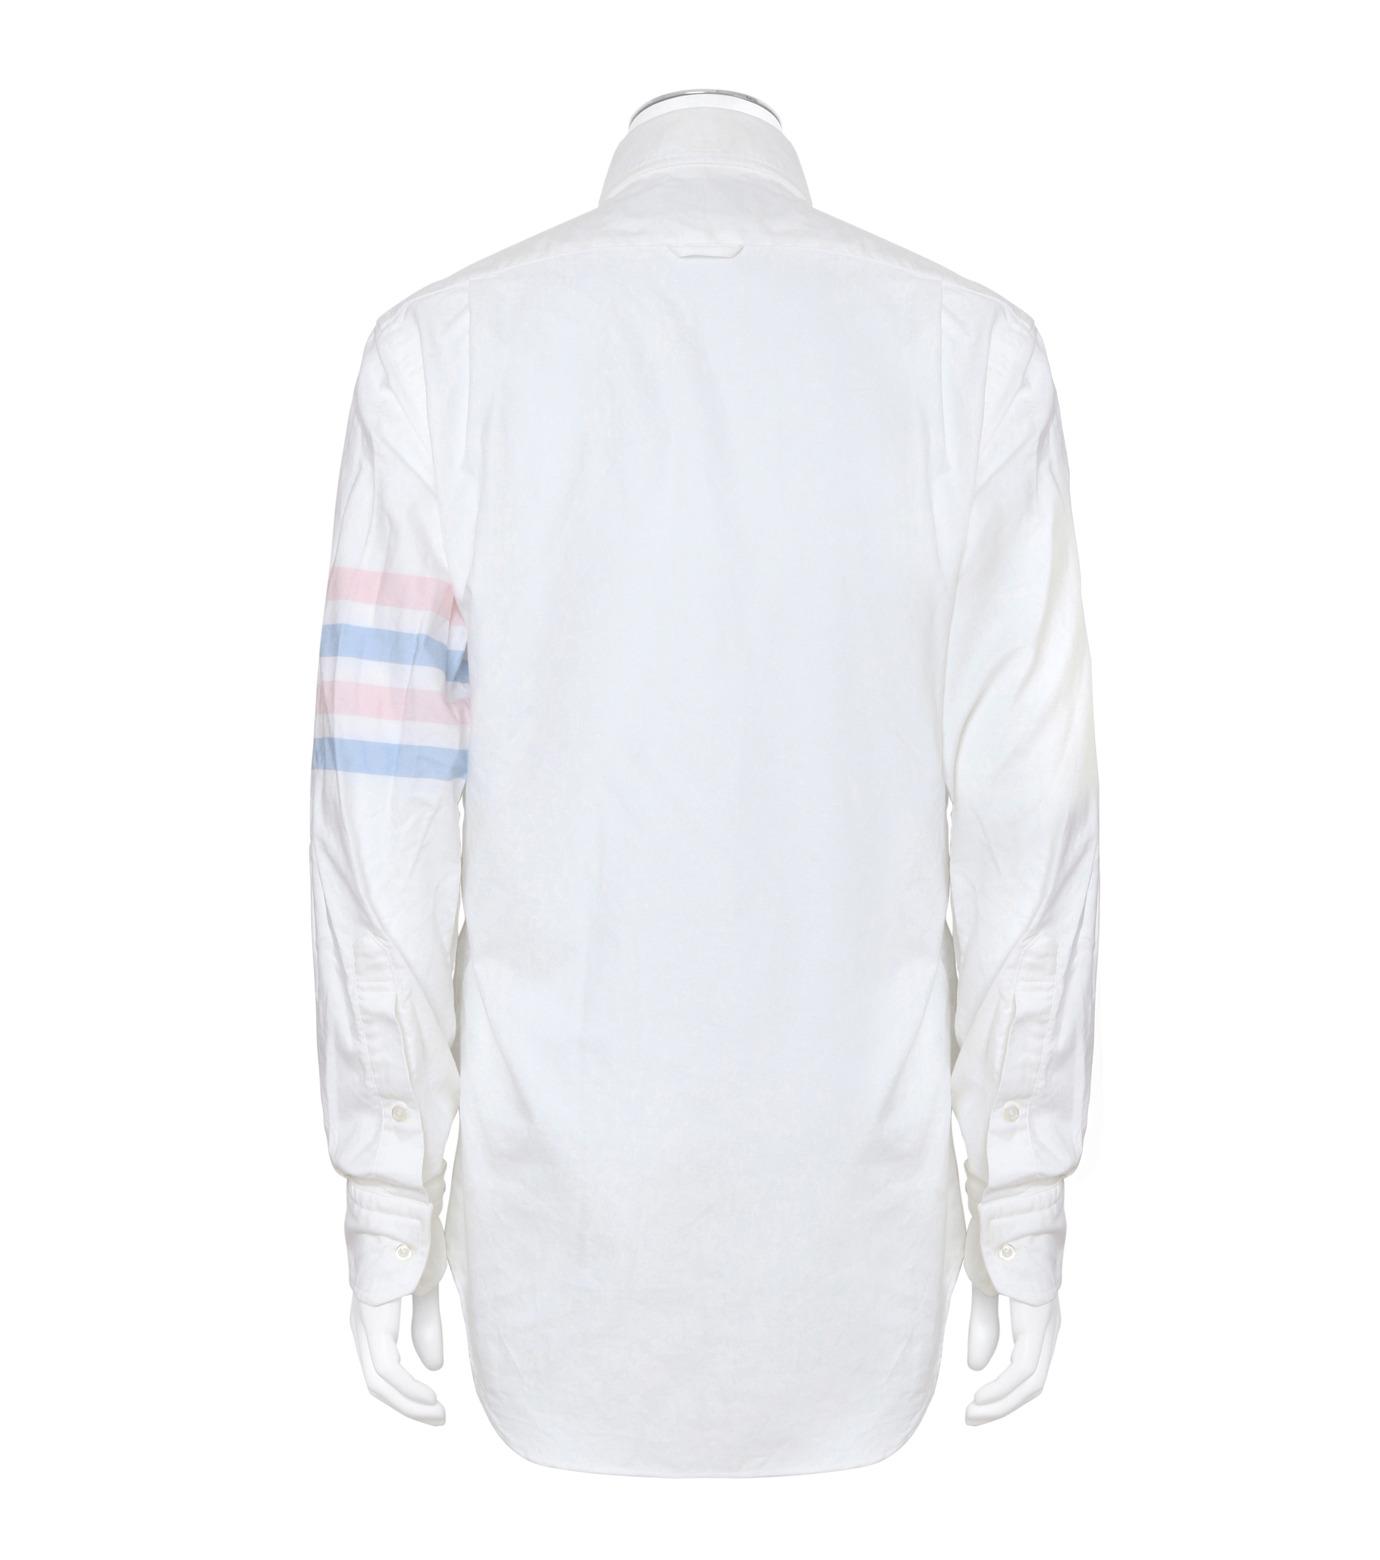 Thom Browne(トムブラウン)のStripe Oxford Shirt-WHITE(シャツ/shirt)-MWL001A00245-4 拡大詳細画像2